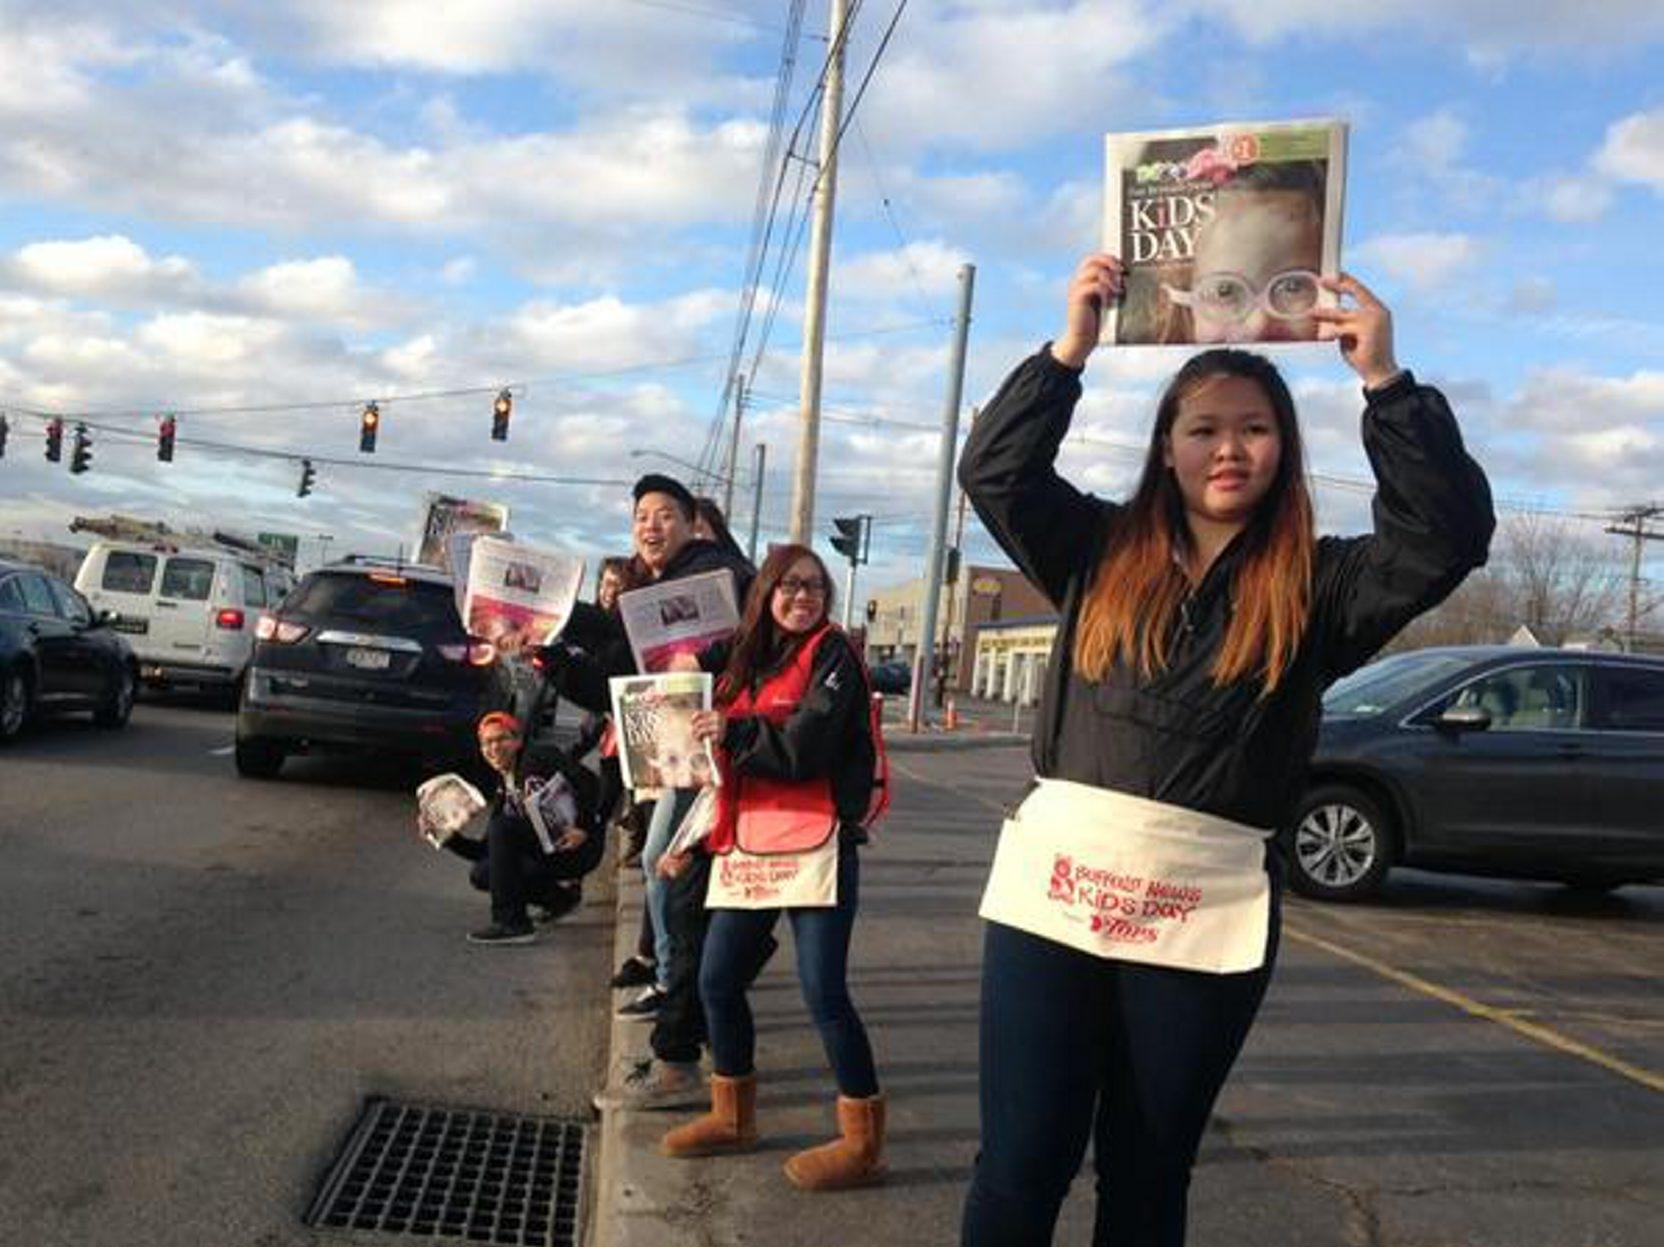 Susan Su, a member of Alpha Kappa Delta Phi, helps sell Kids Day special editions of The Buffalo News April 28, 2015. (John Hickey/Buffalo News)